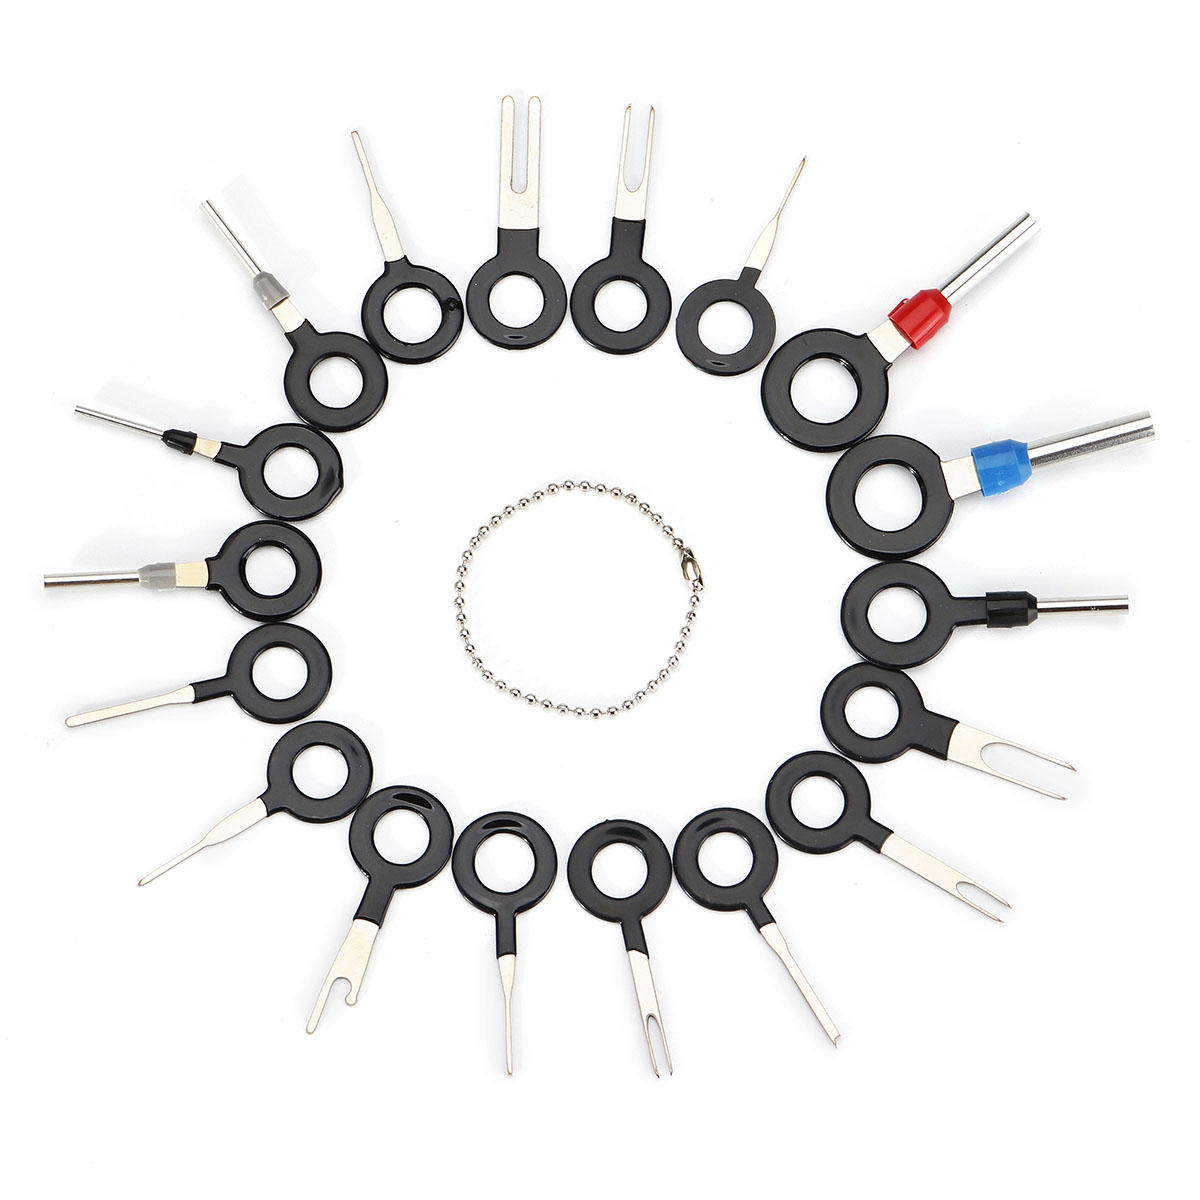 18pcs Terminal Removal Tool Kit Wiring Connector Pin